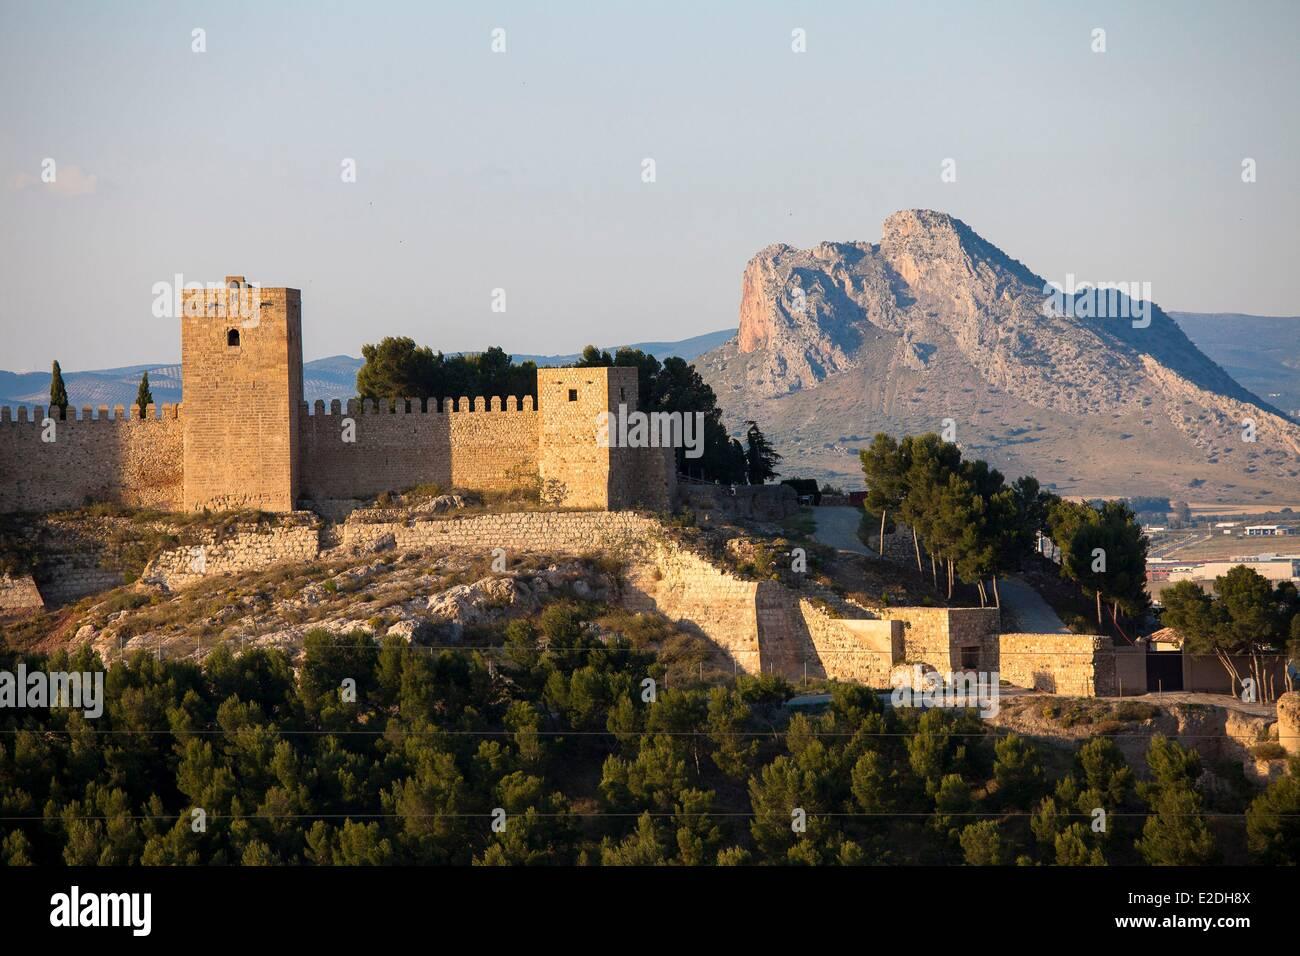 Spain, Andalusia, Antequera, Alcazaba and Pennon de los Enamorados (Mount of lovers) - Stock Image